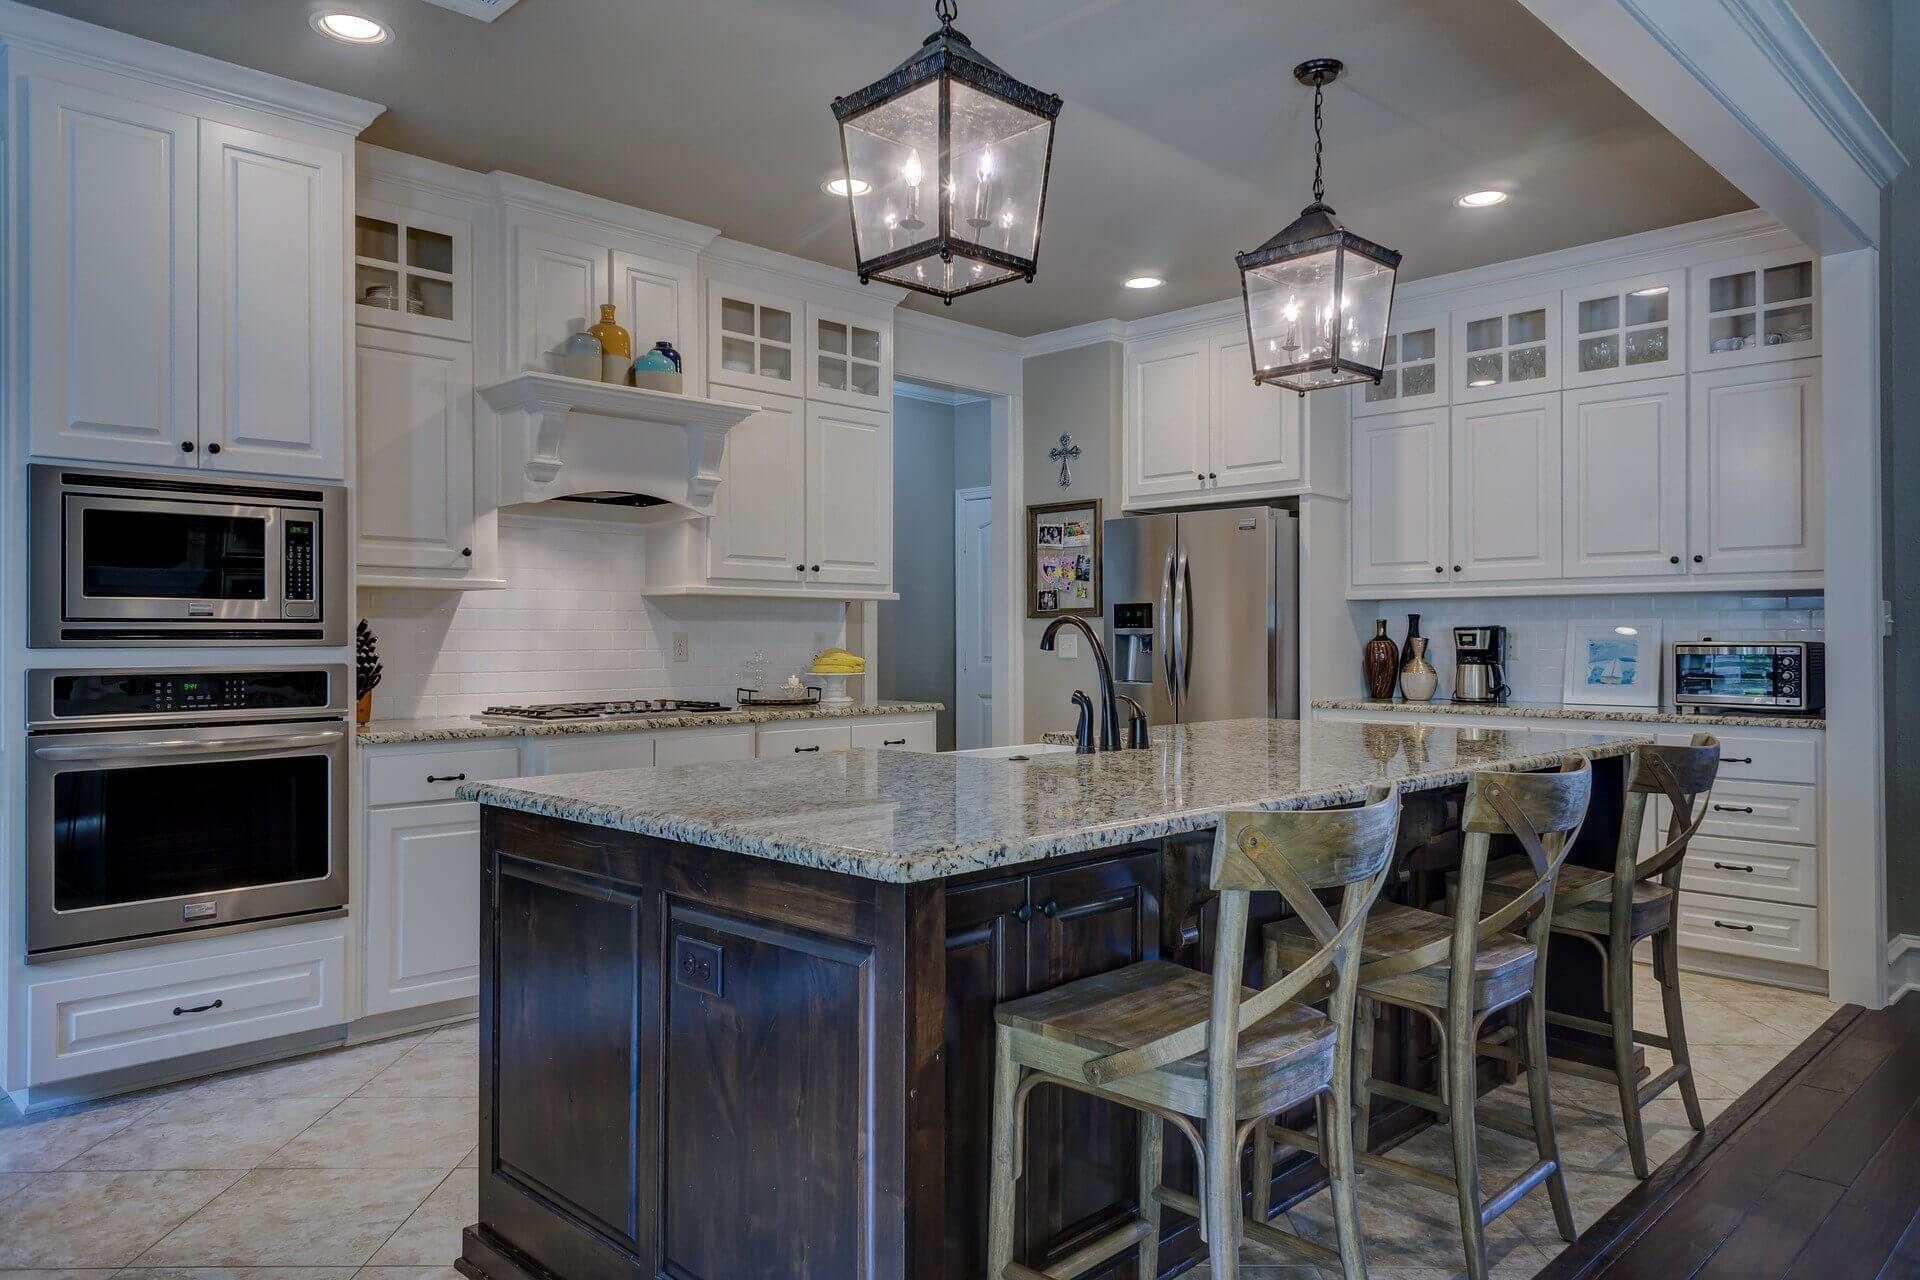 Top 5 Value Added Interior Remodeling Upgrades